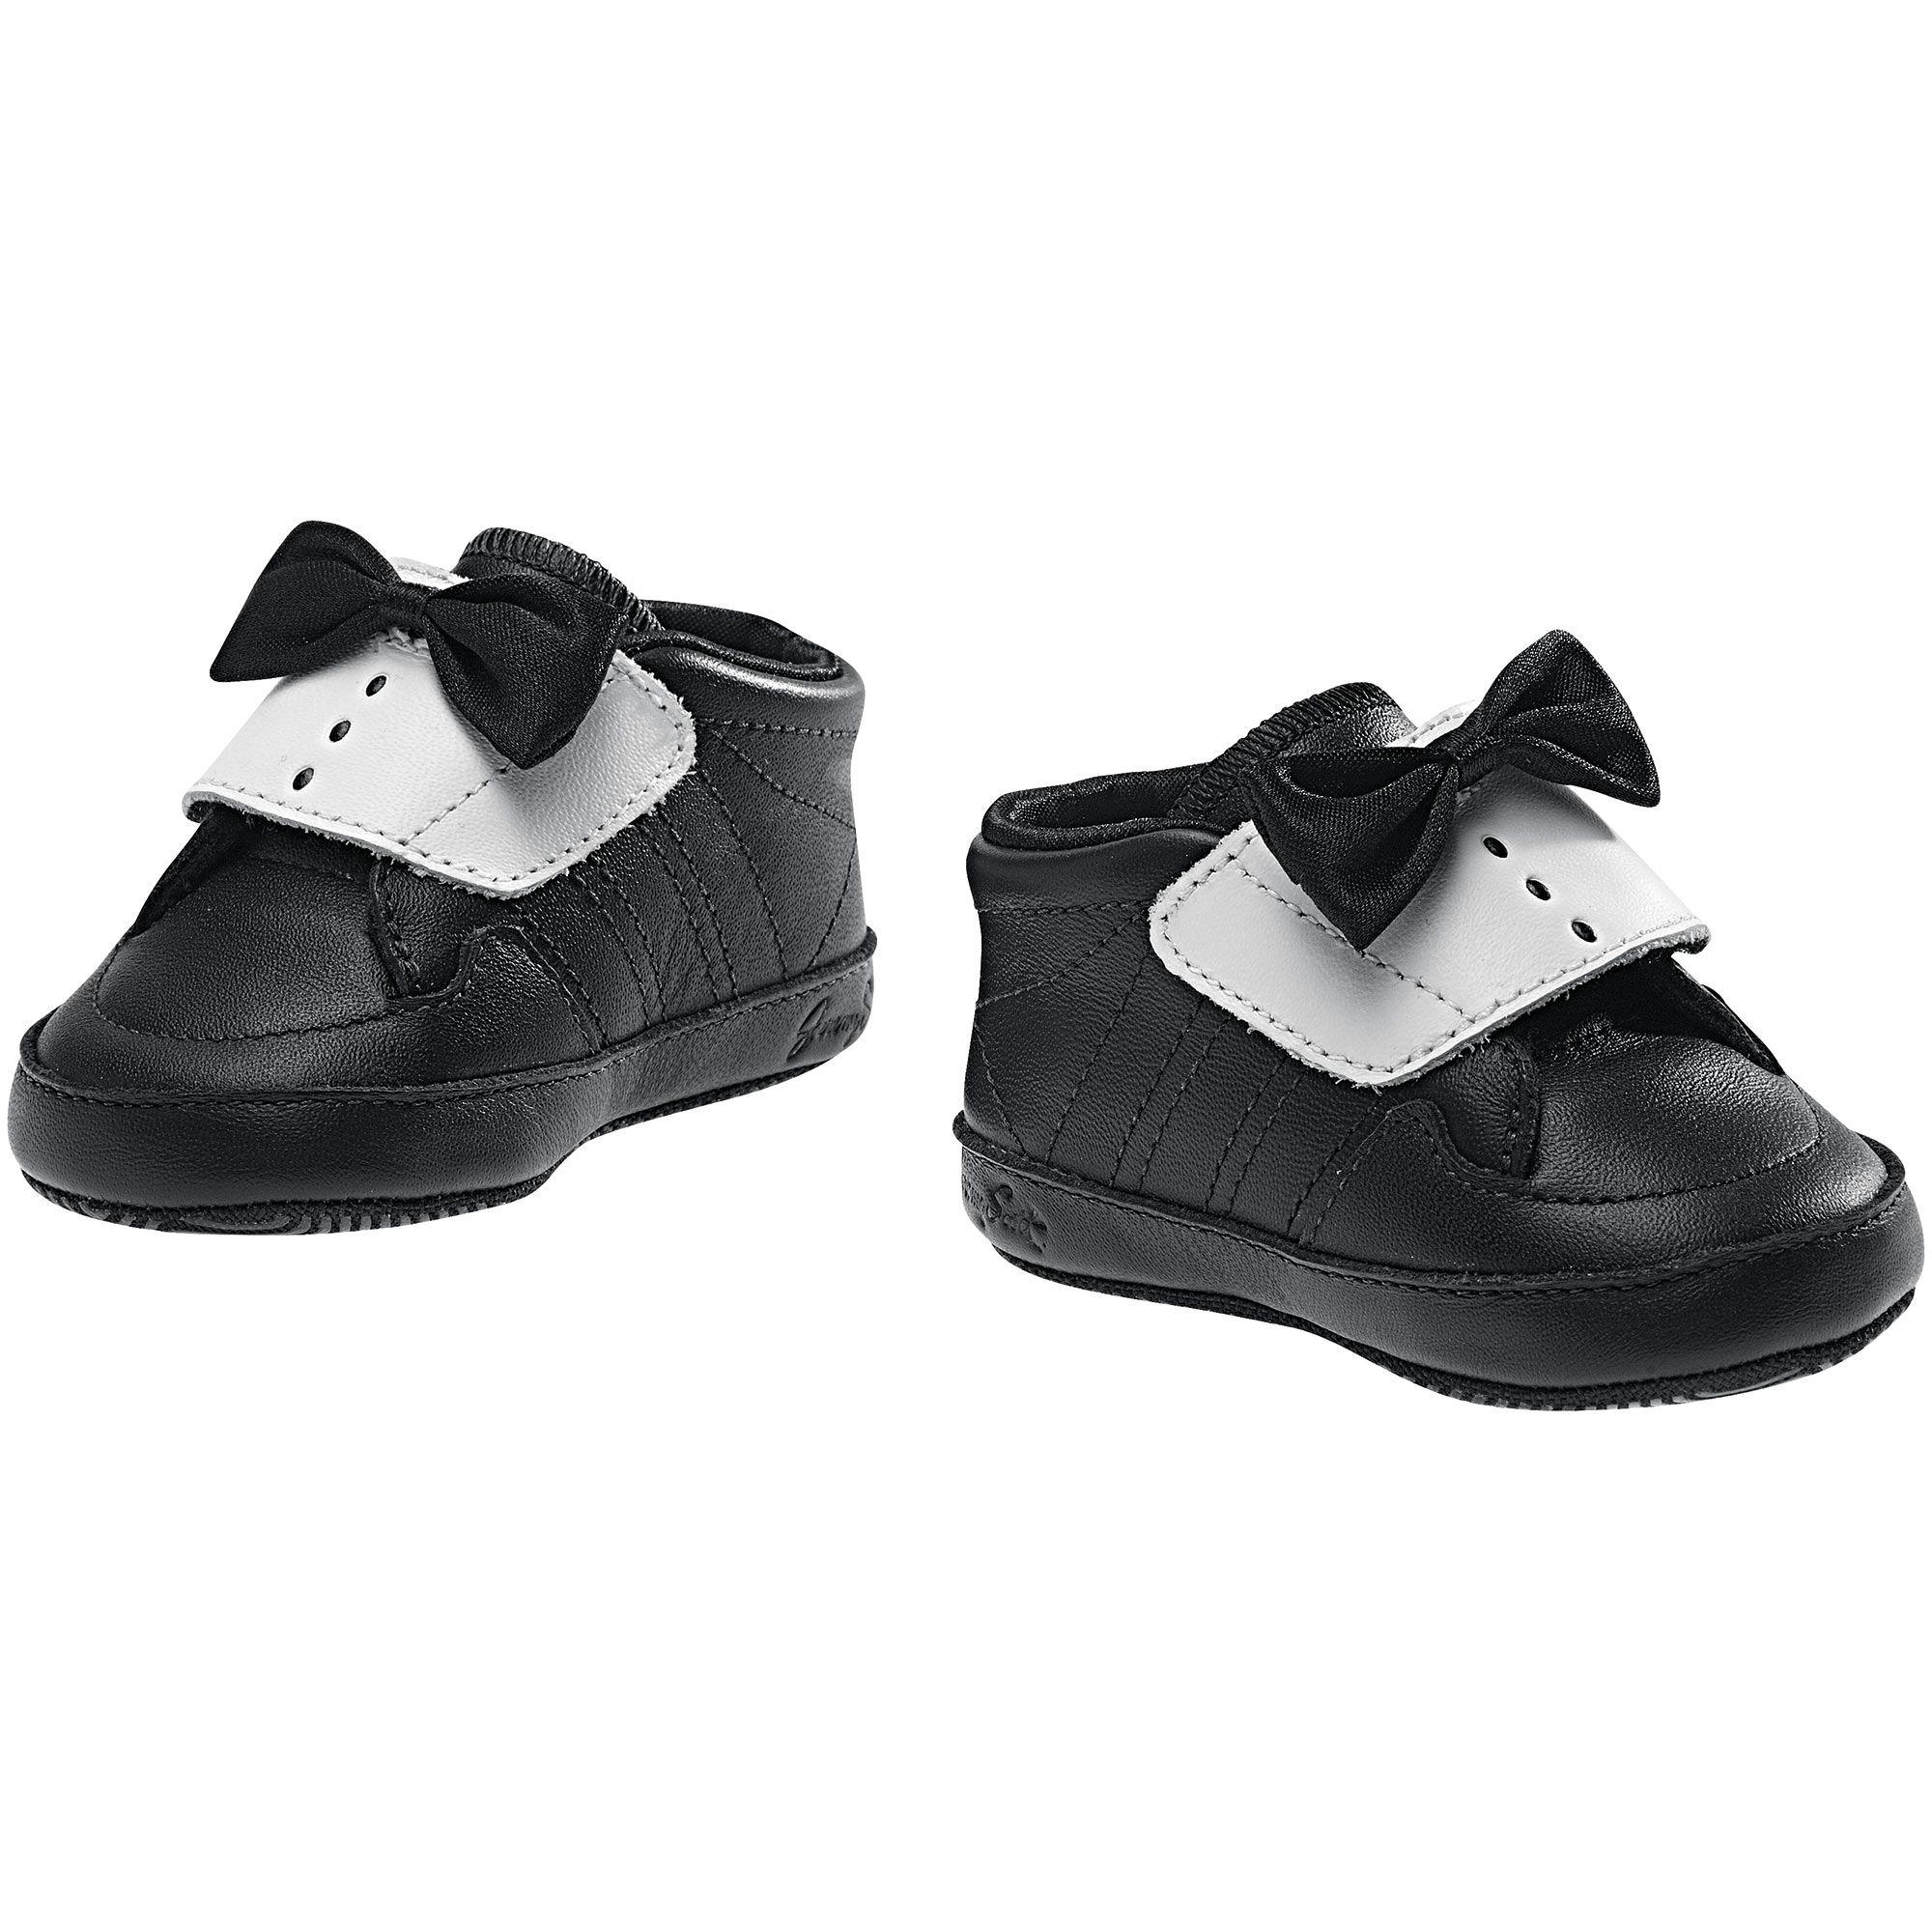 nordstrom crib cribs c shoes baby toms boy boys